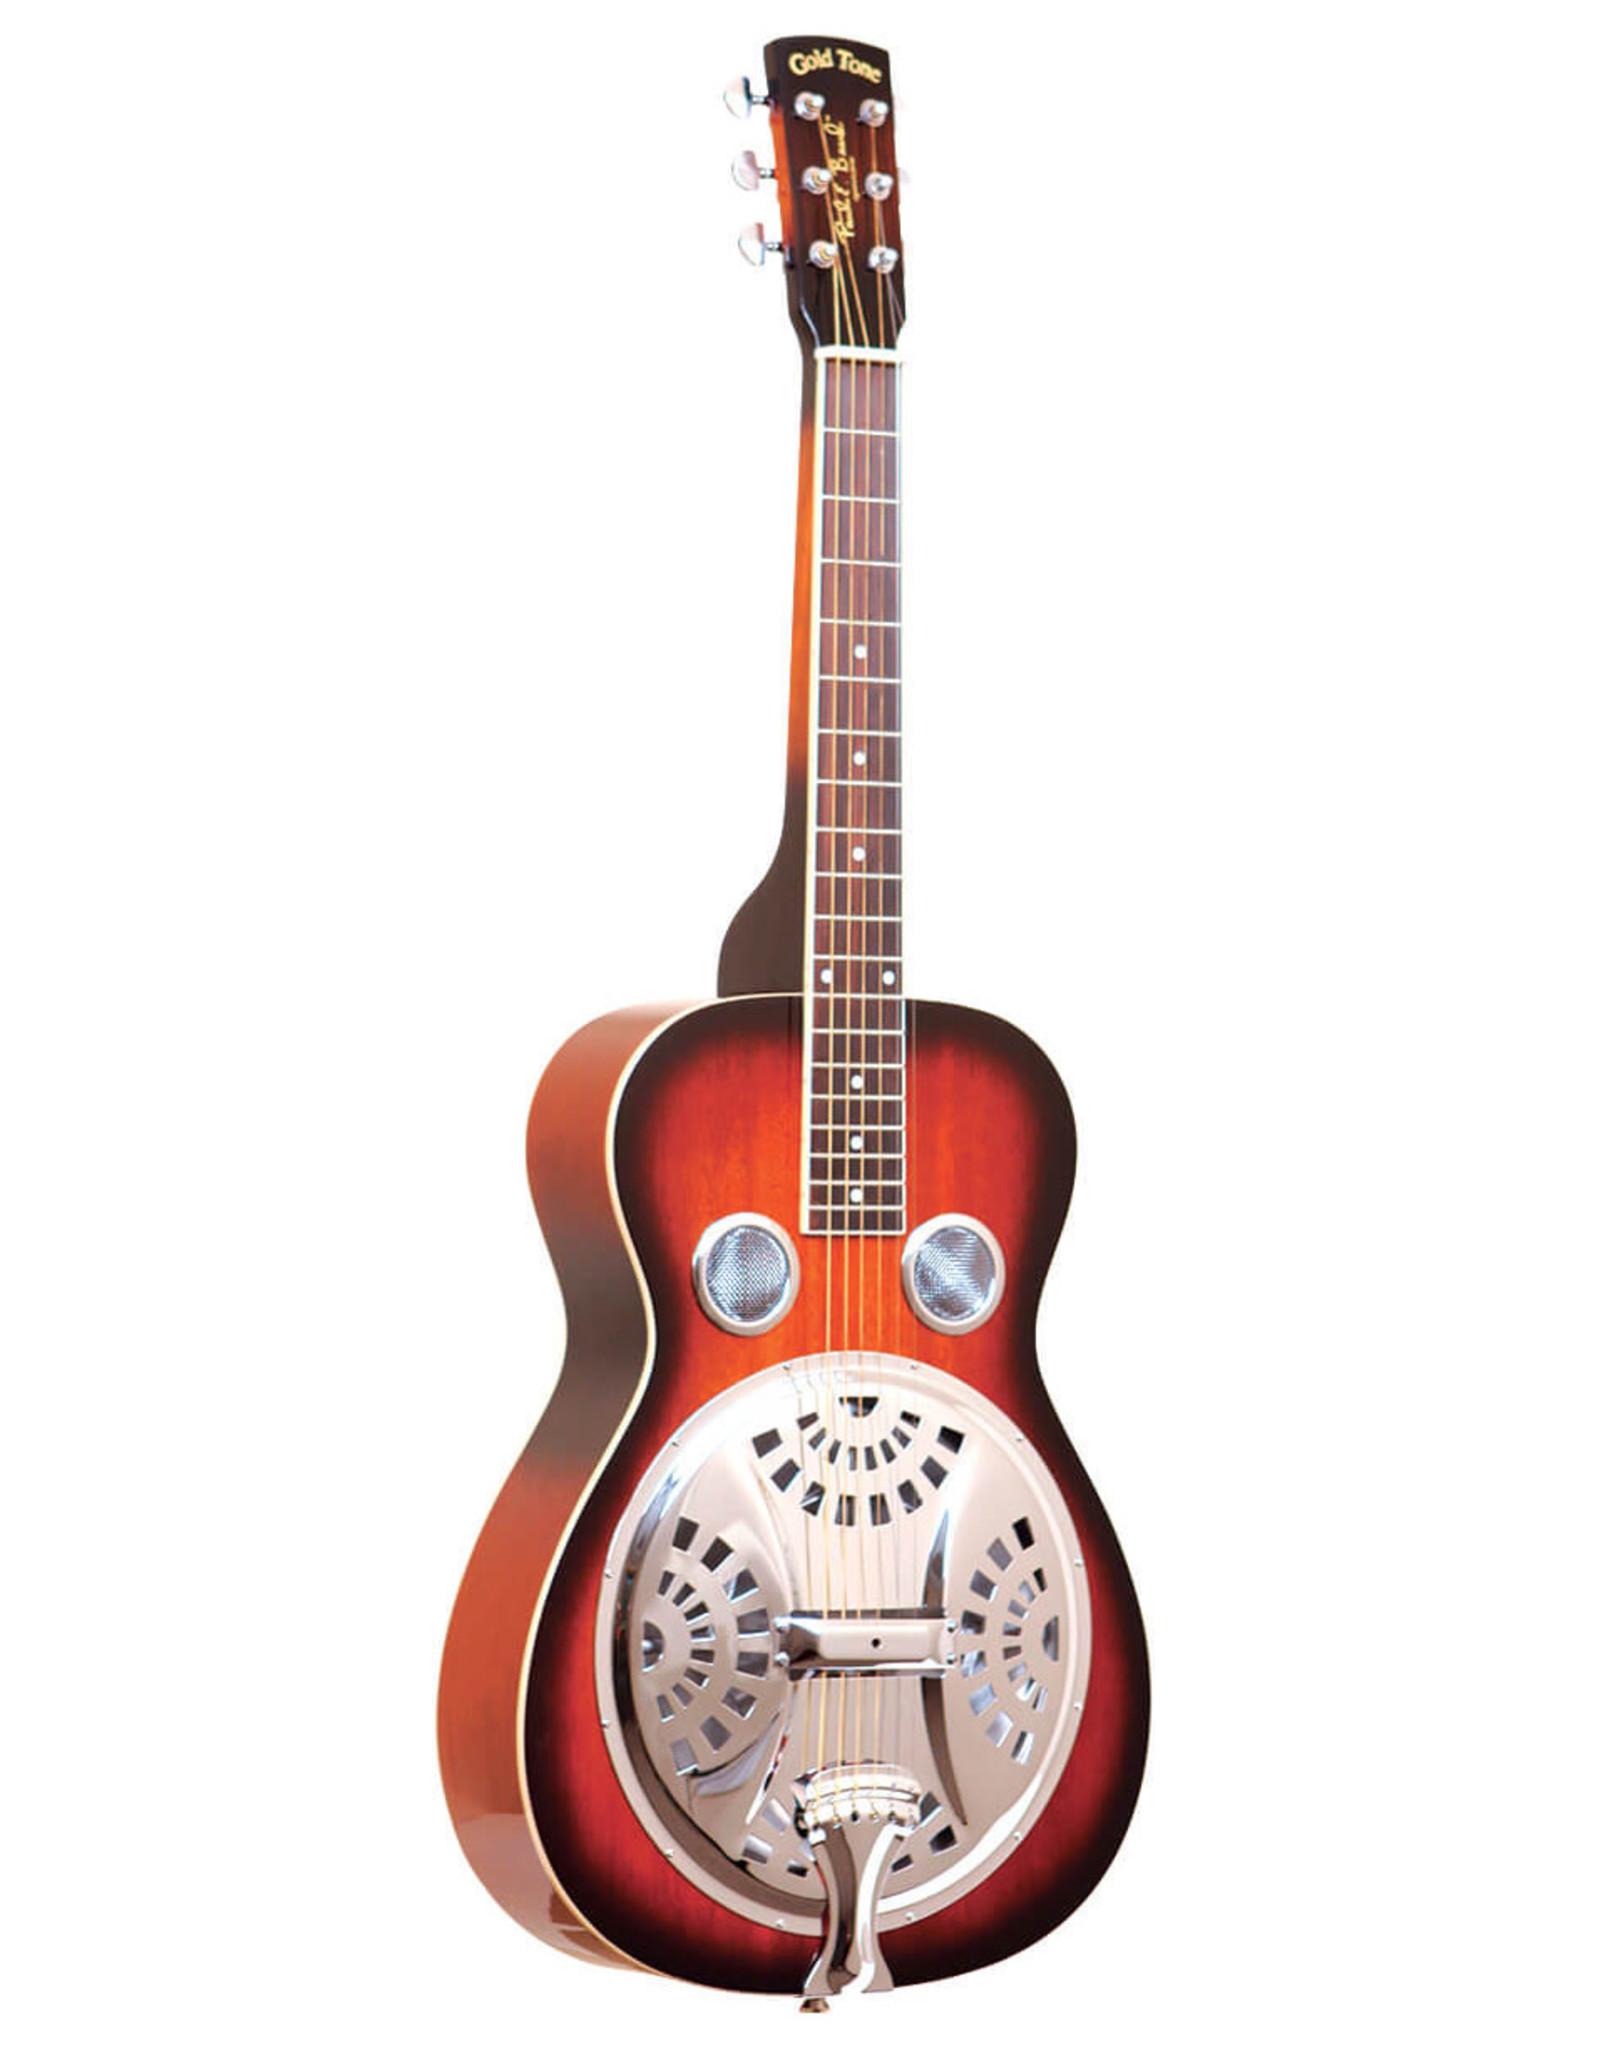 Gold Tone Gold Tone PBS: Paul Beard Signature-Series Squareneck Resonator Guitar w/Case